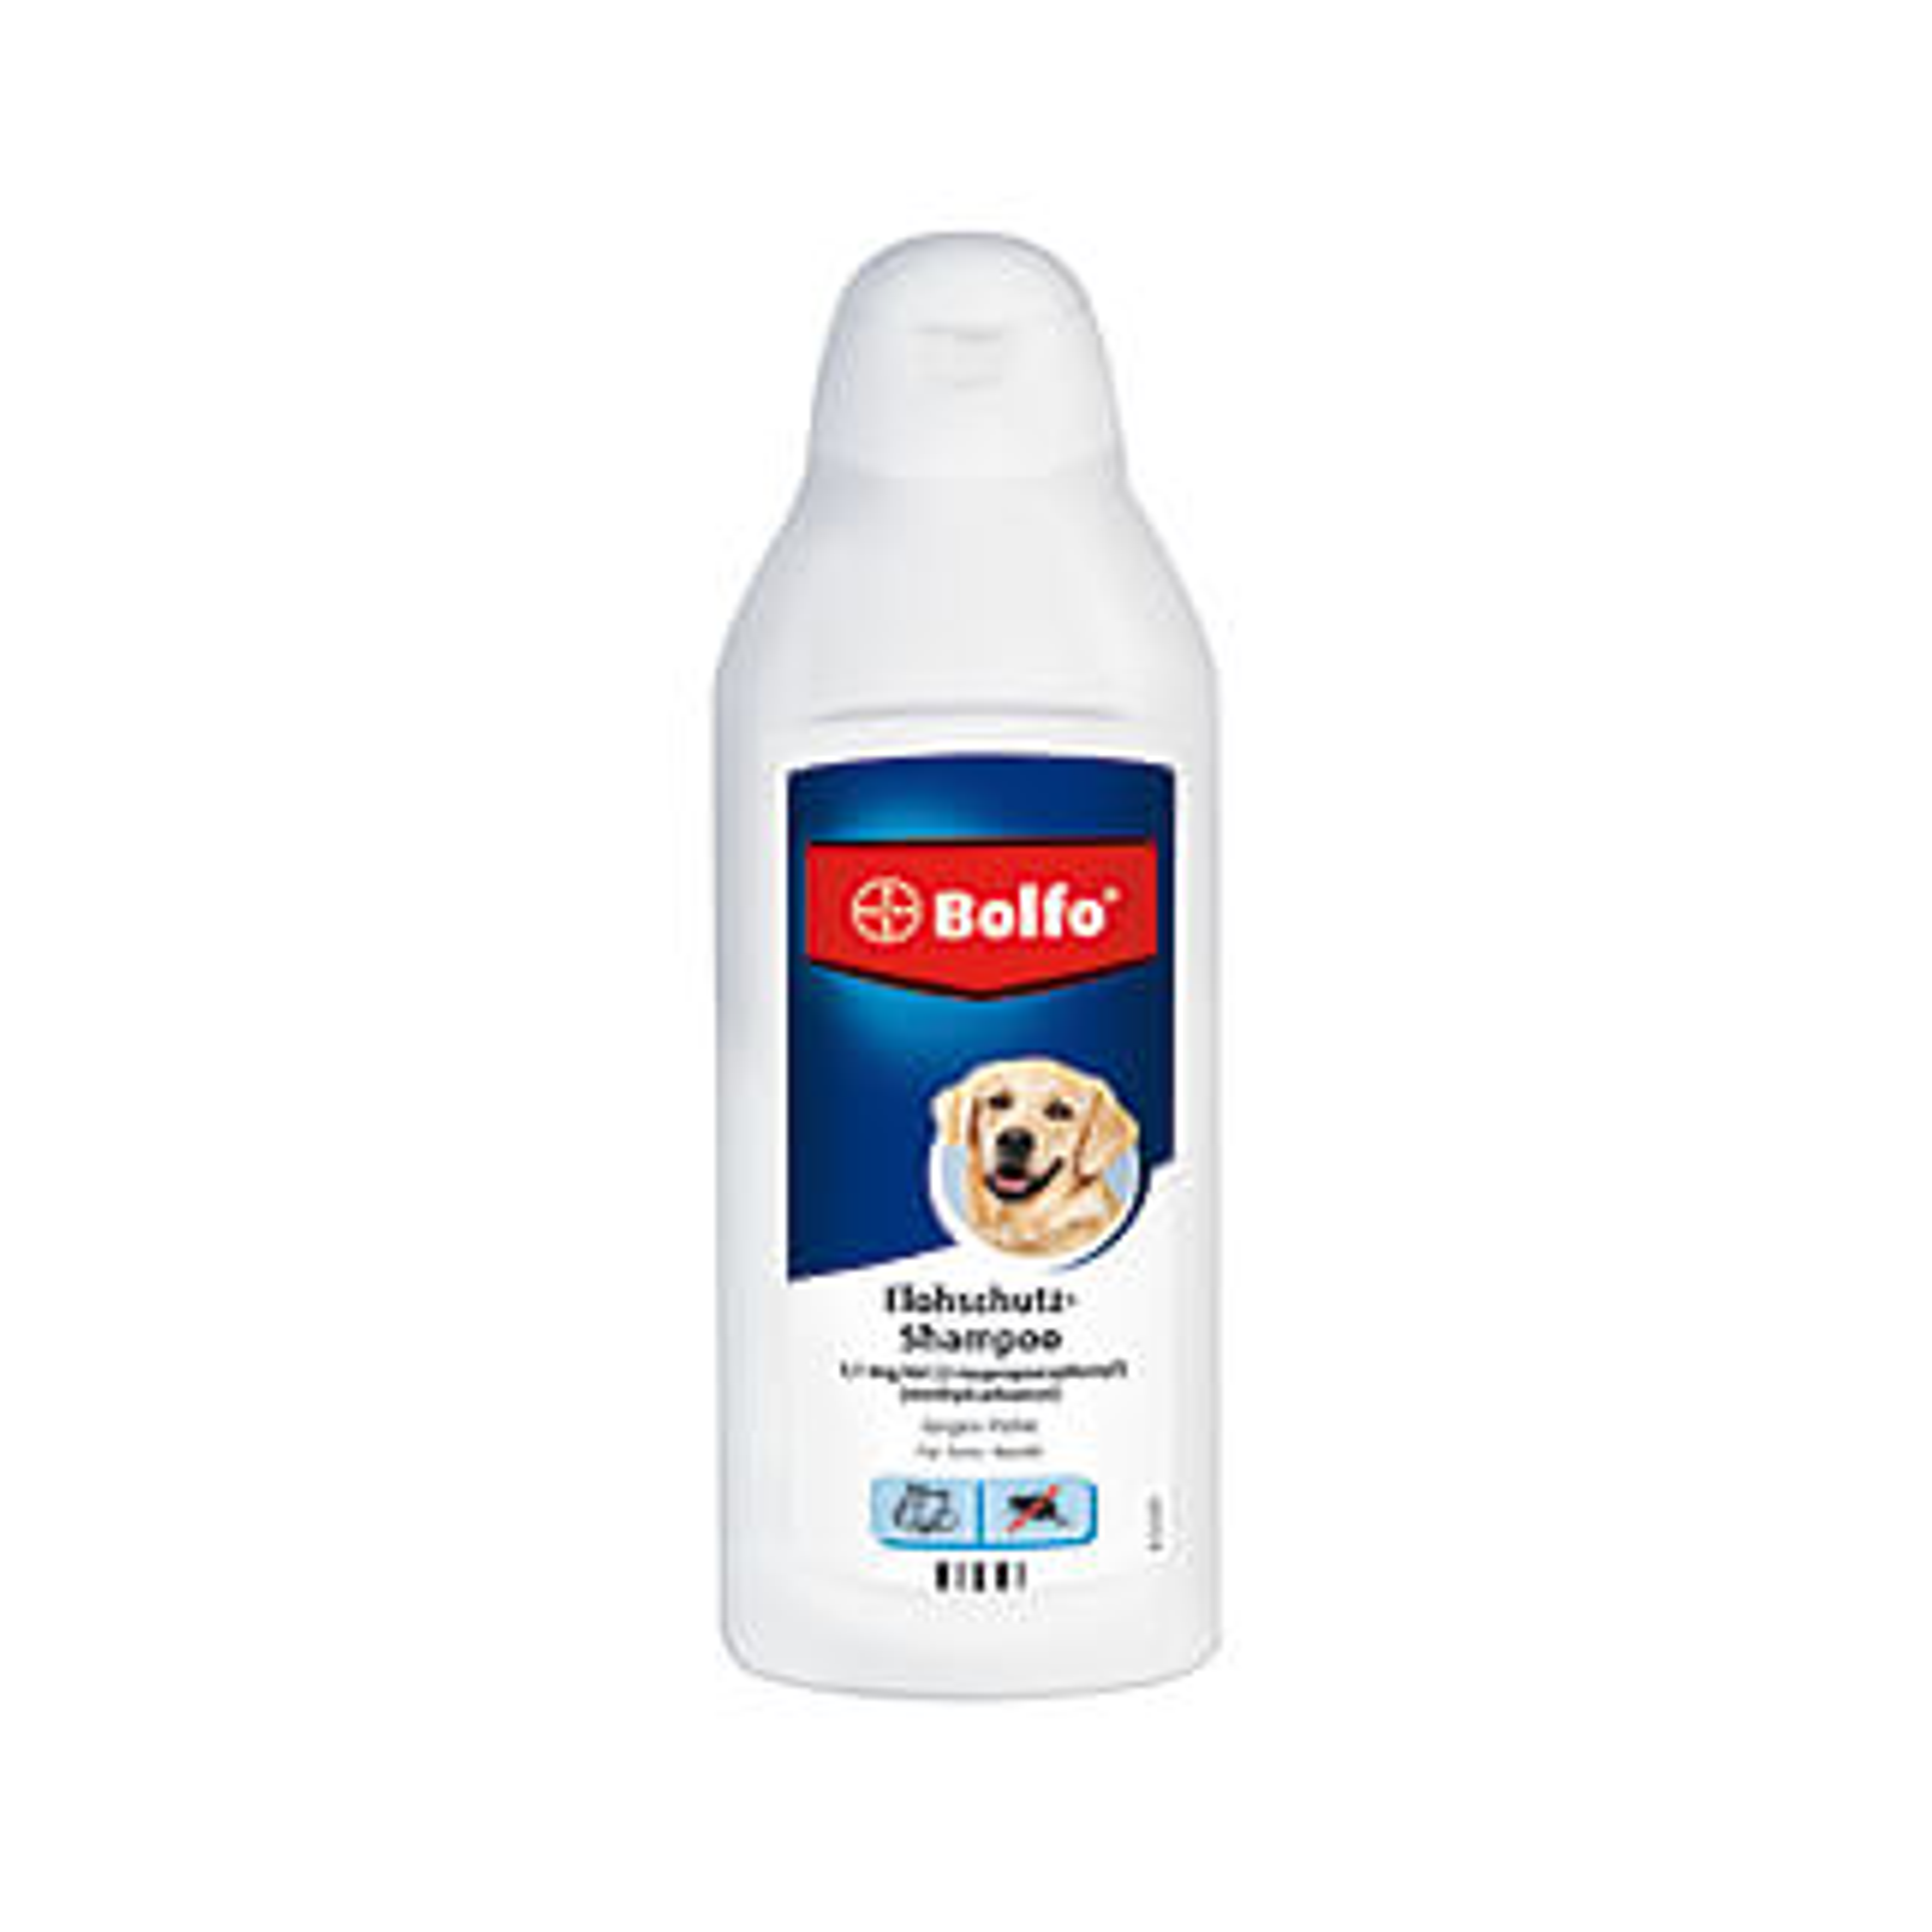 Bolfo Flohschutz Shampoo